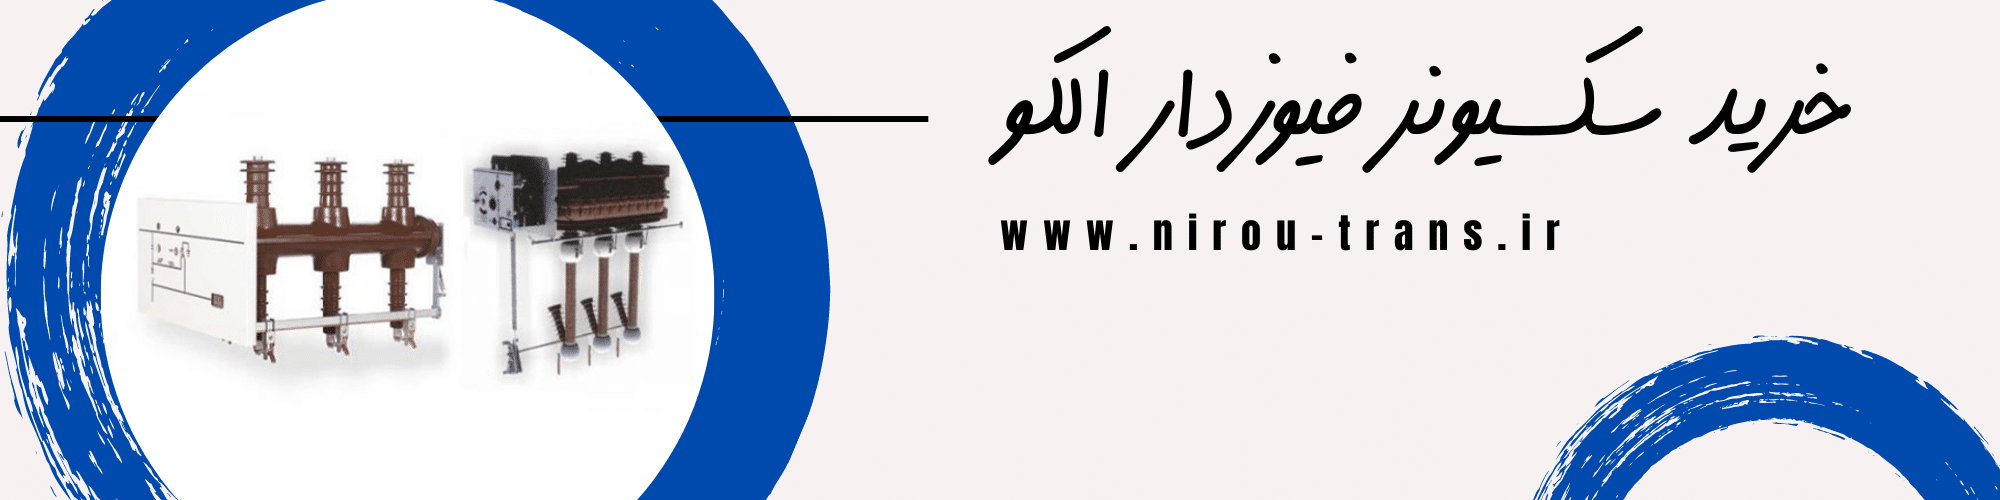 سکسیونر فیوز دار الکو